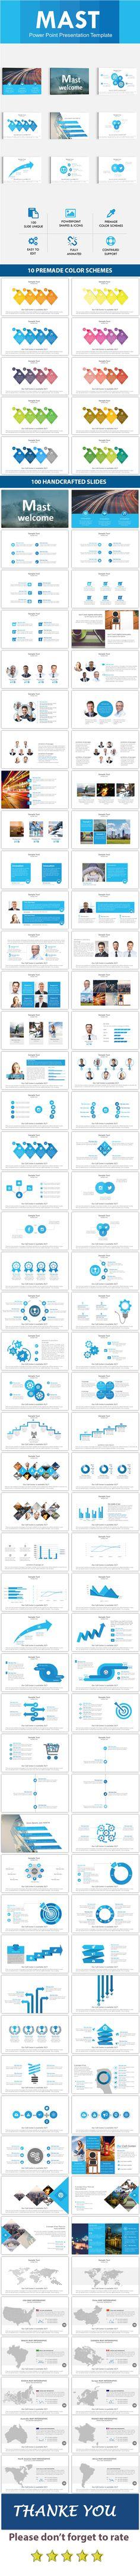 Mast Powerpoint Presentation Template